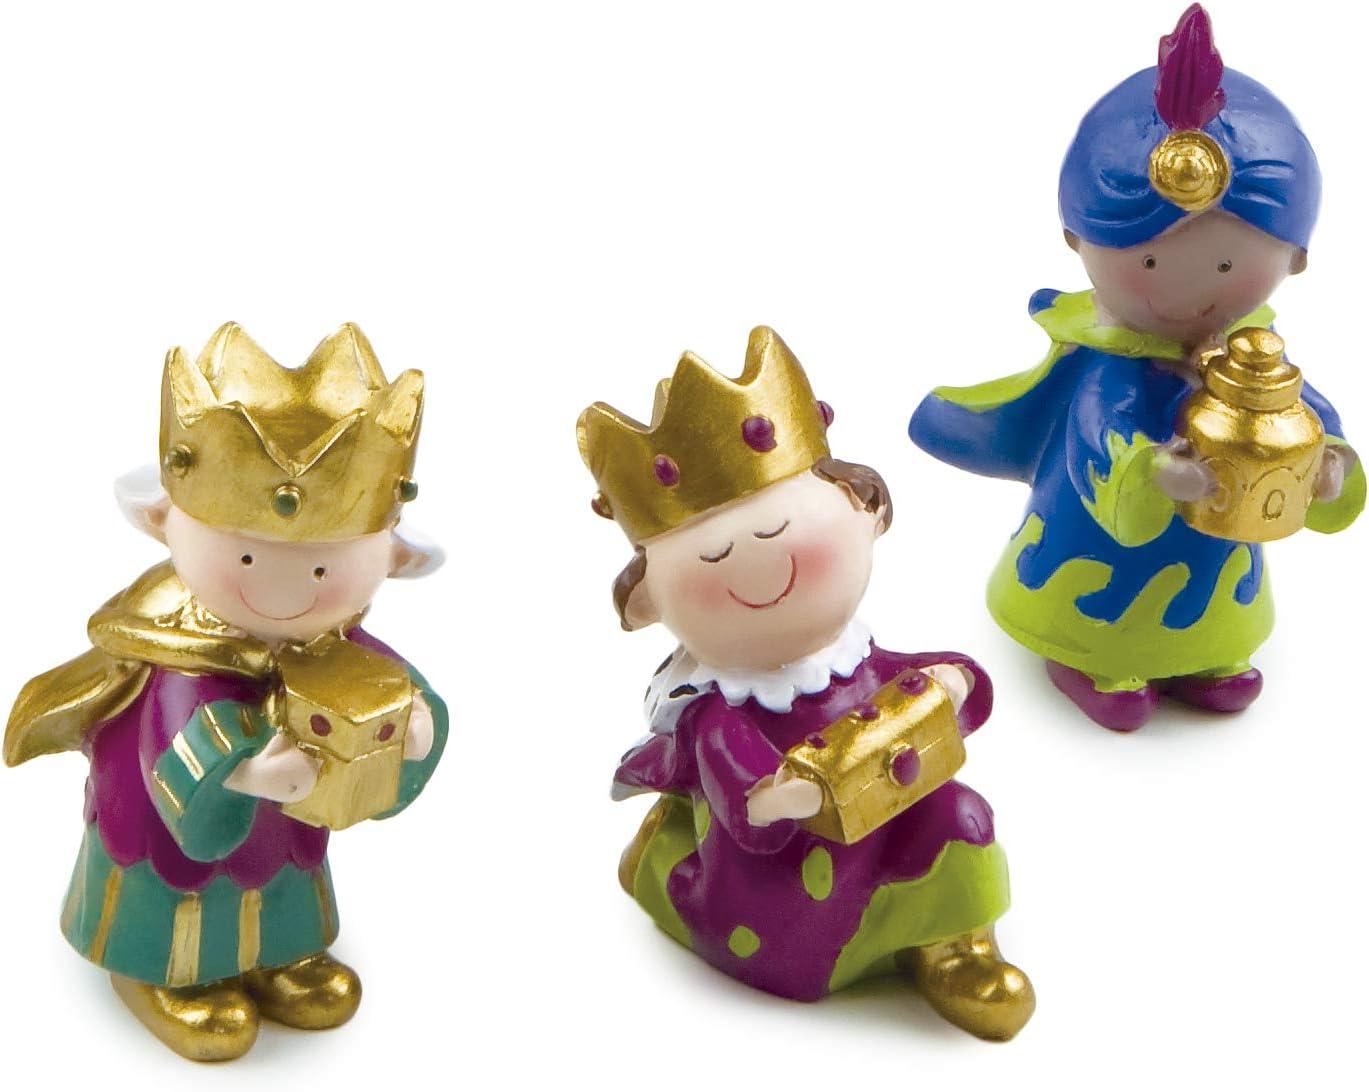 Mopec Figuras de Reyes Magos, Resina, Multicolor, 4x3.5x7 cm, 3 Unidades